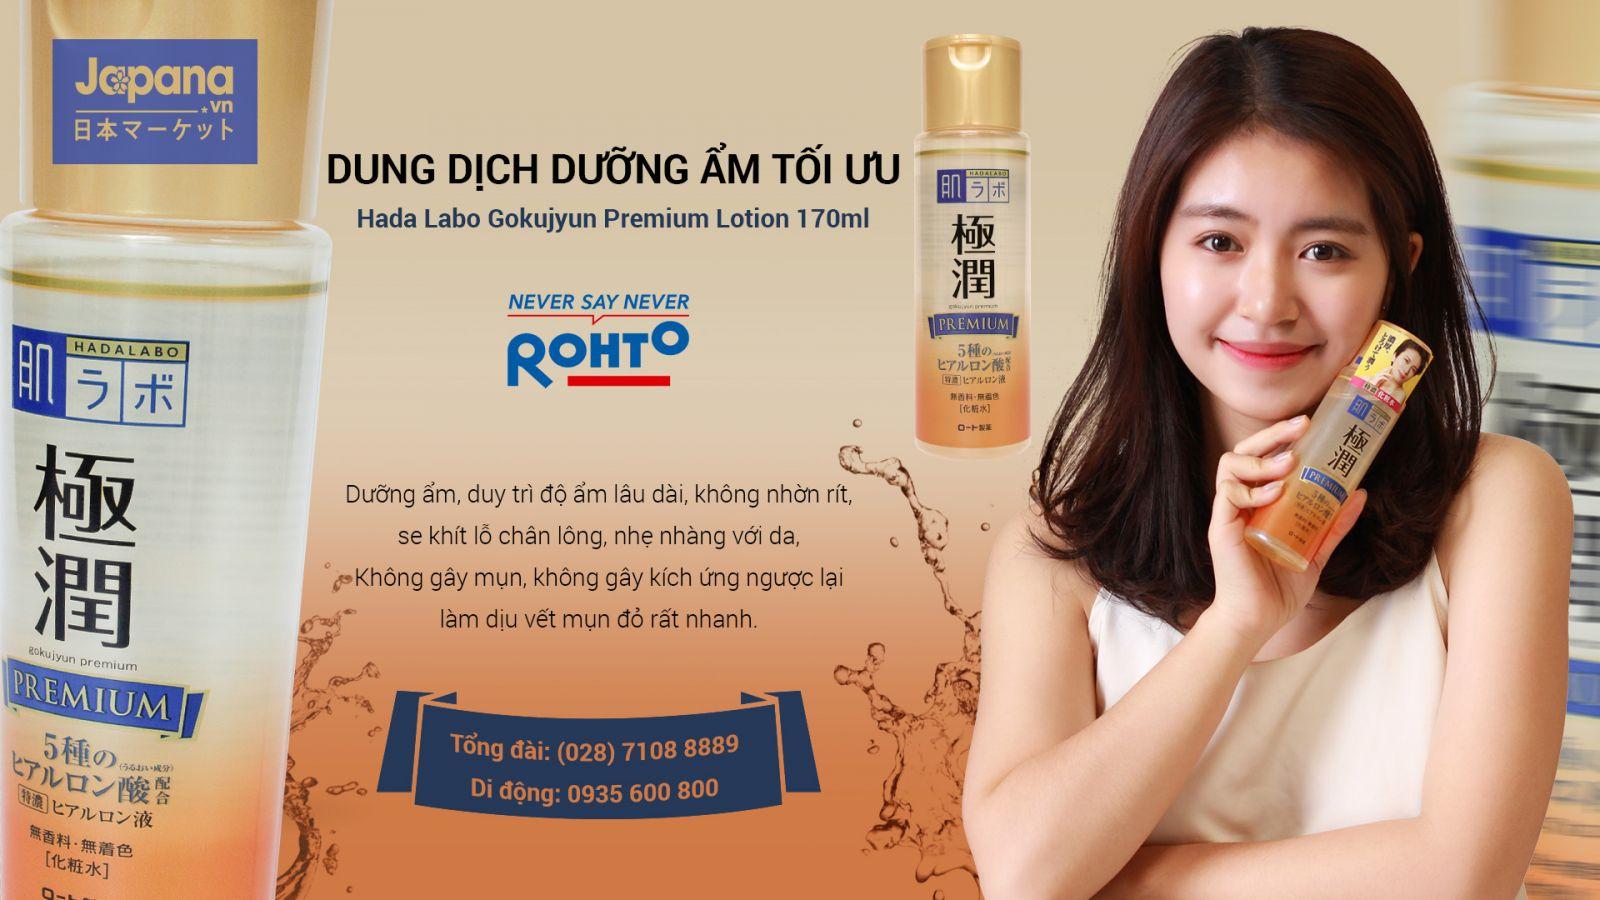 Dung dịch dưỡng ẩm Hada Labo Gokujyun Premium Lotion